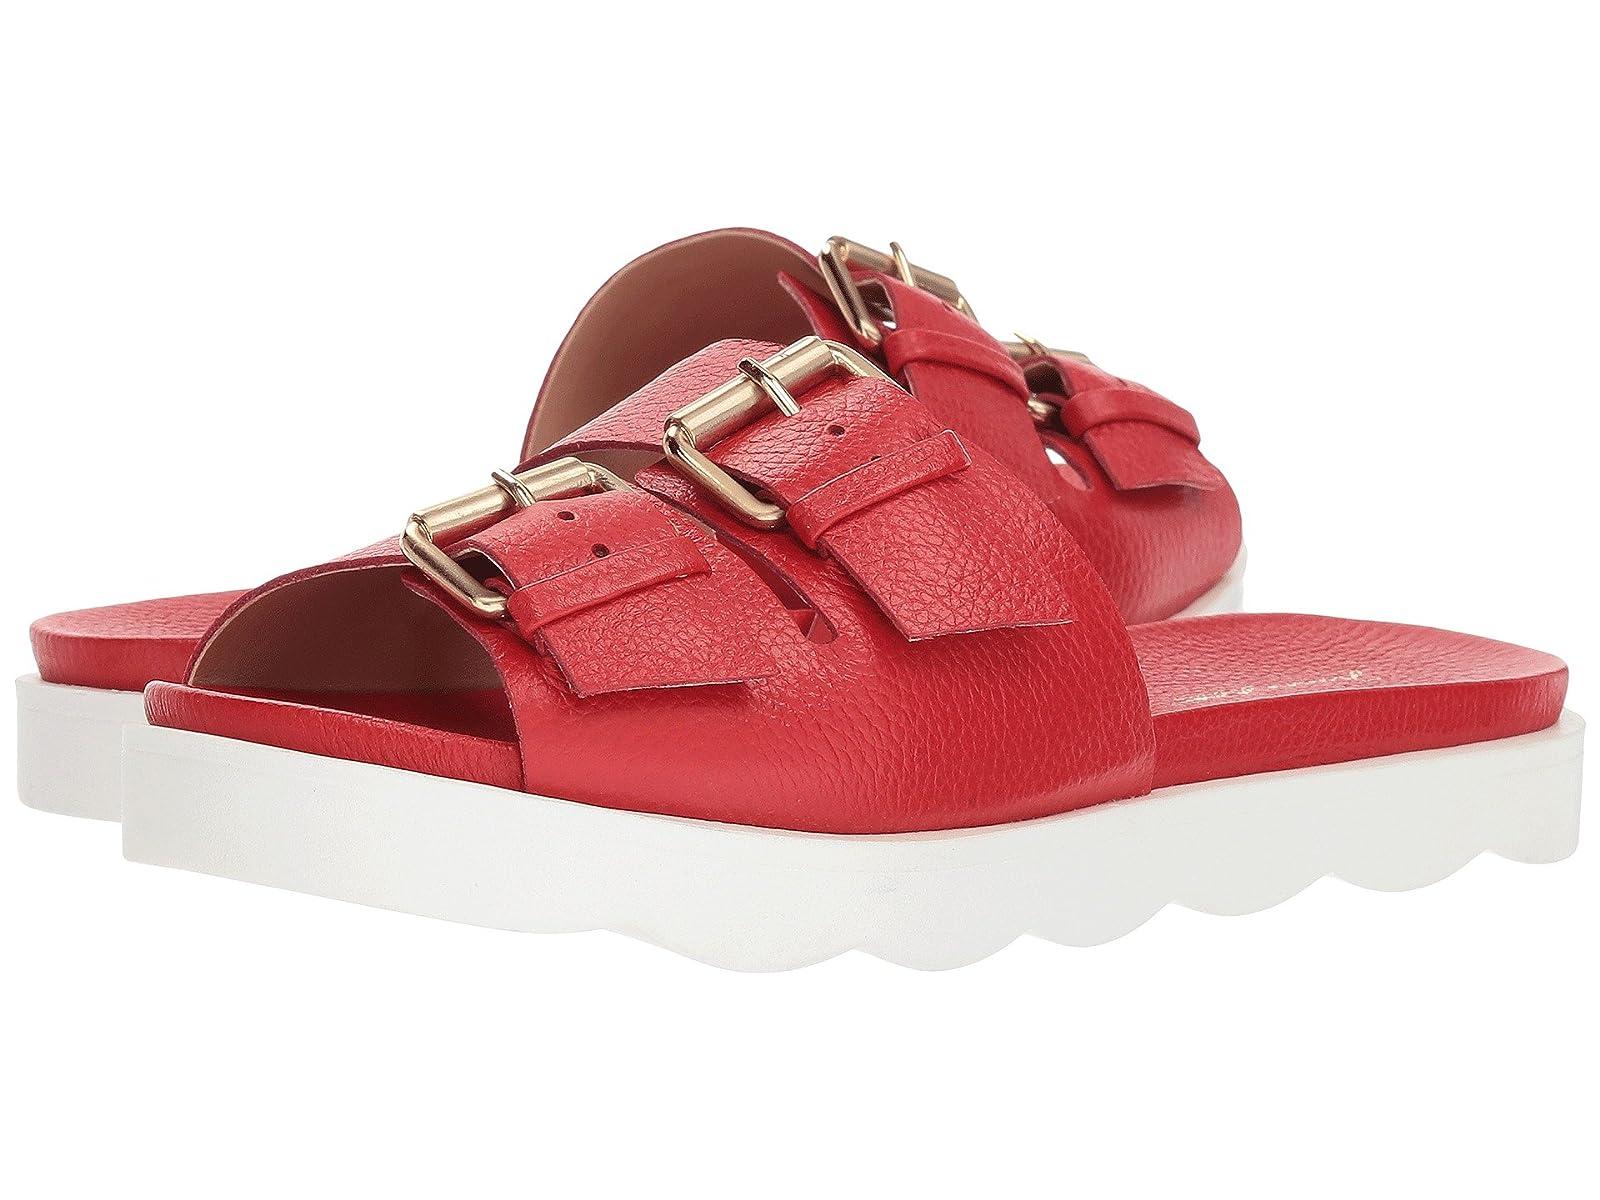 Massimo Matteo RaeganAtmospheric grades have affordable shoes